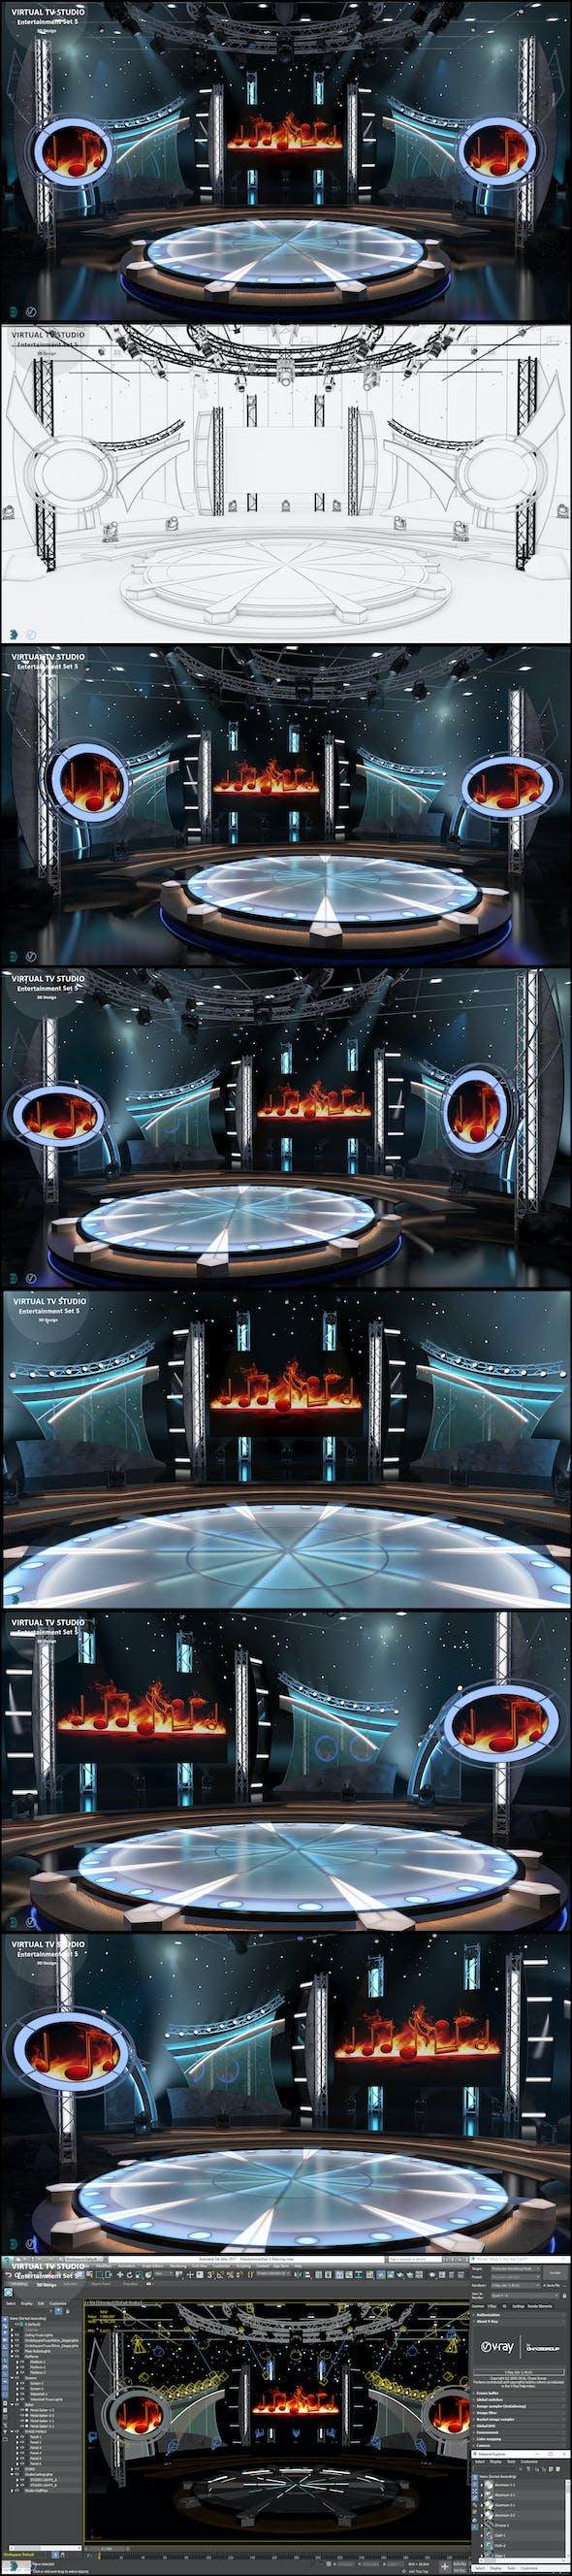 Virtual TV Studio Entertainment Set 5 - 3DOcean Item for Sale